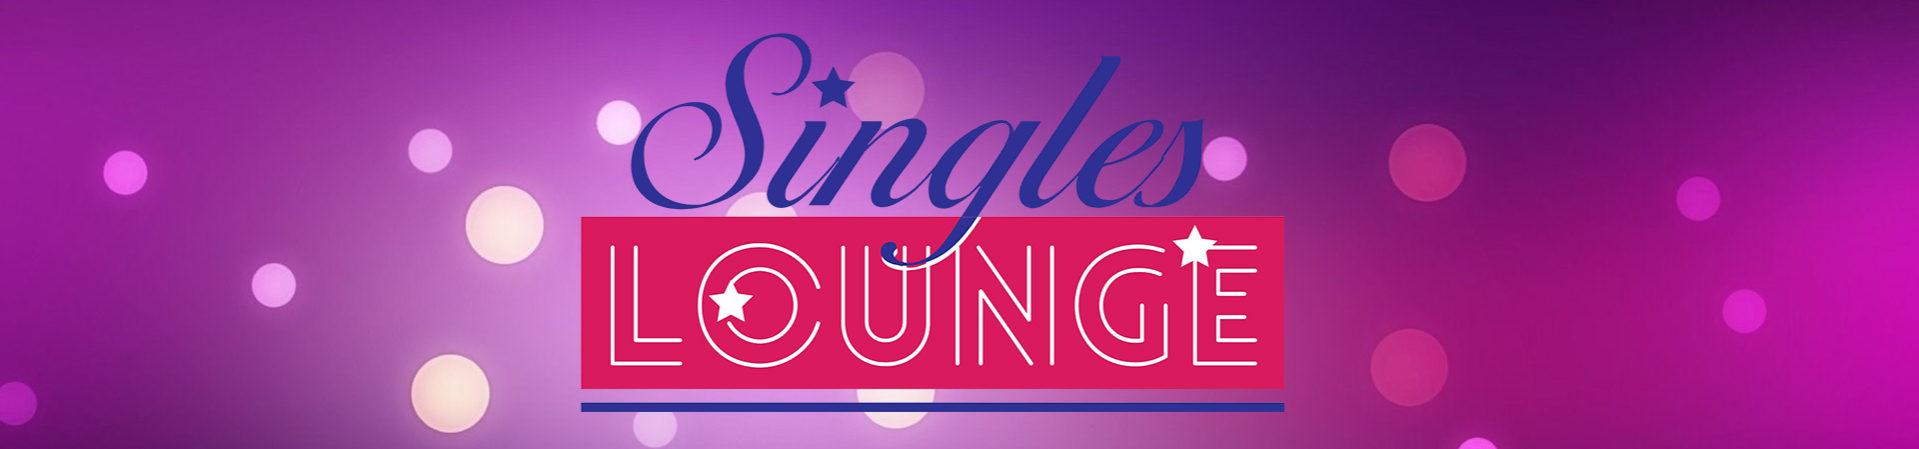 Singles Lounge